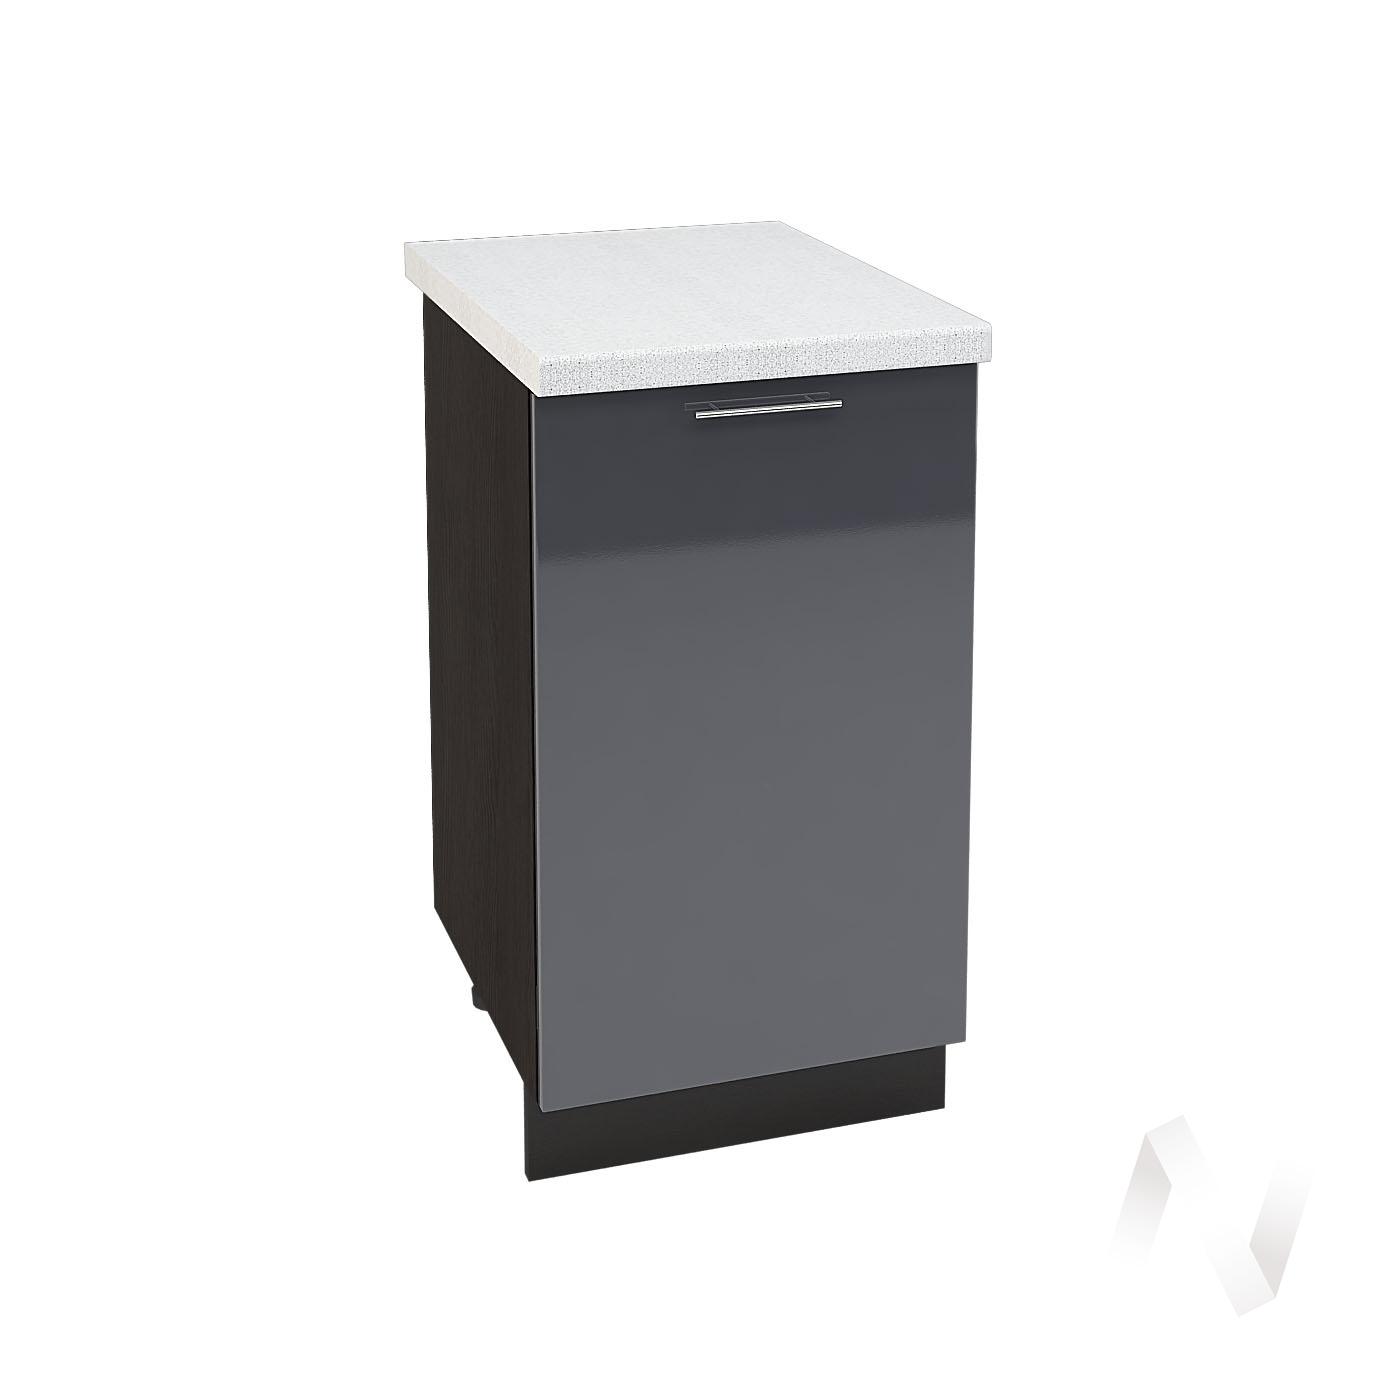 "Кухня ""Валерия-М"": Шкаф нижний 450, ШН 450 (Антрацит глянец/корпус венге)"